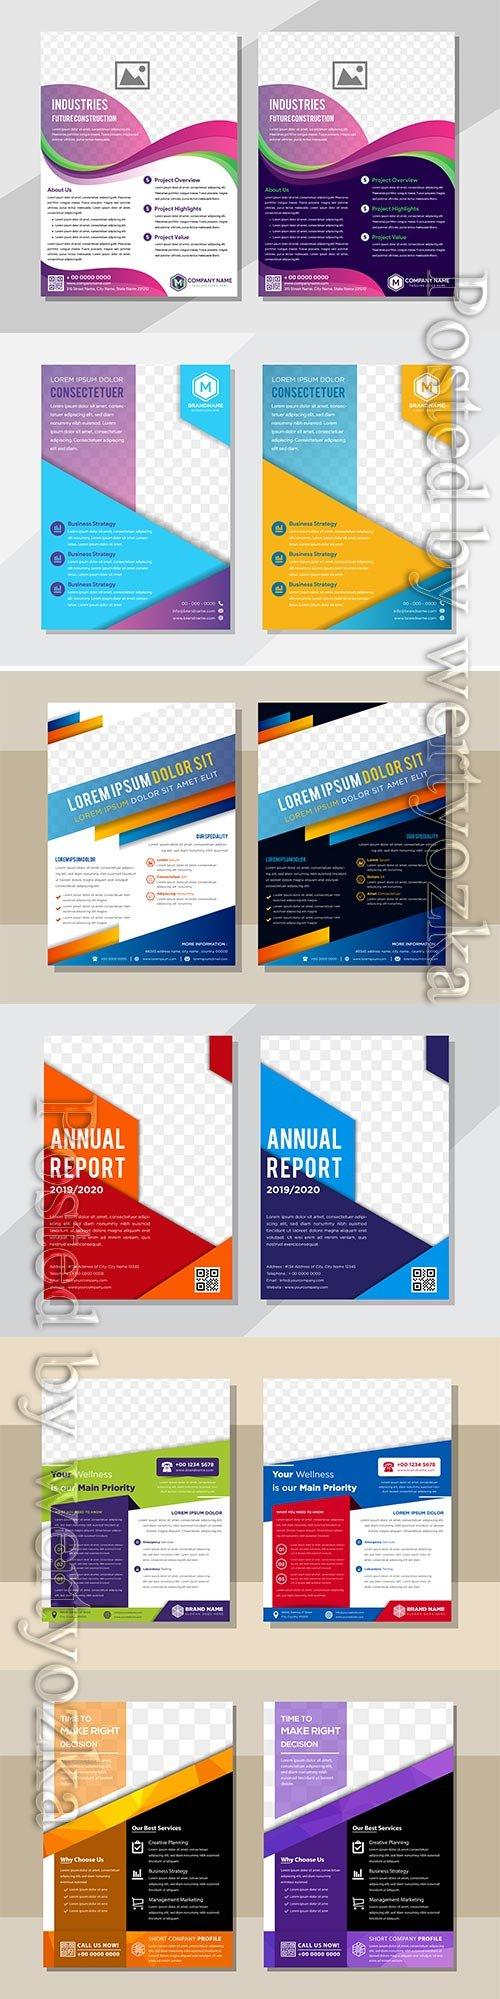 Business flyer template design, brochure vector illustration